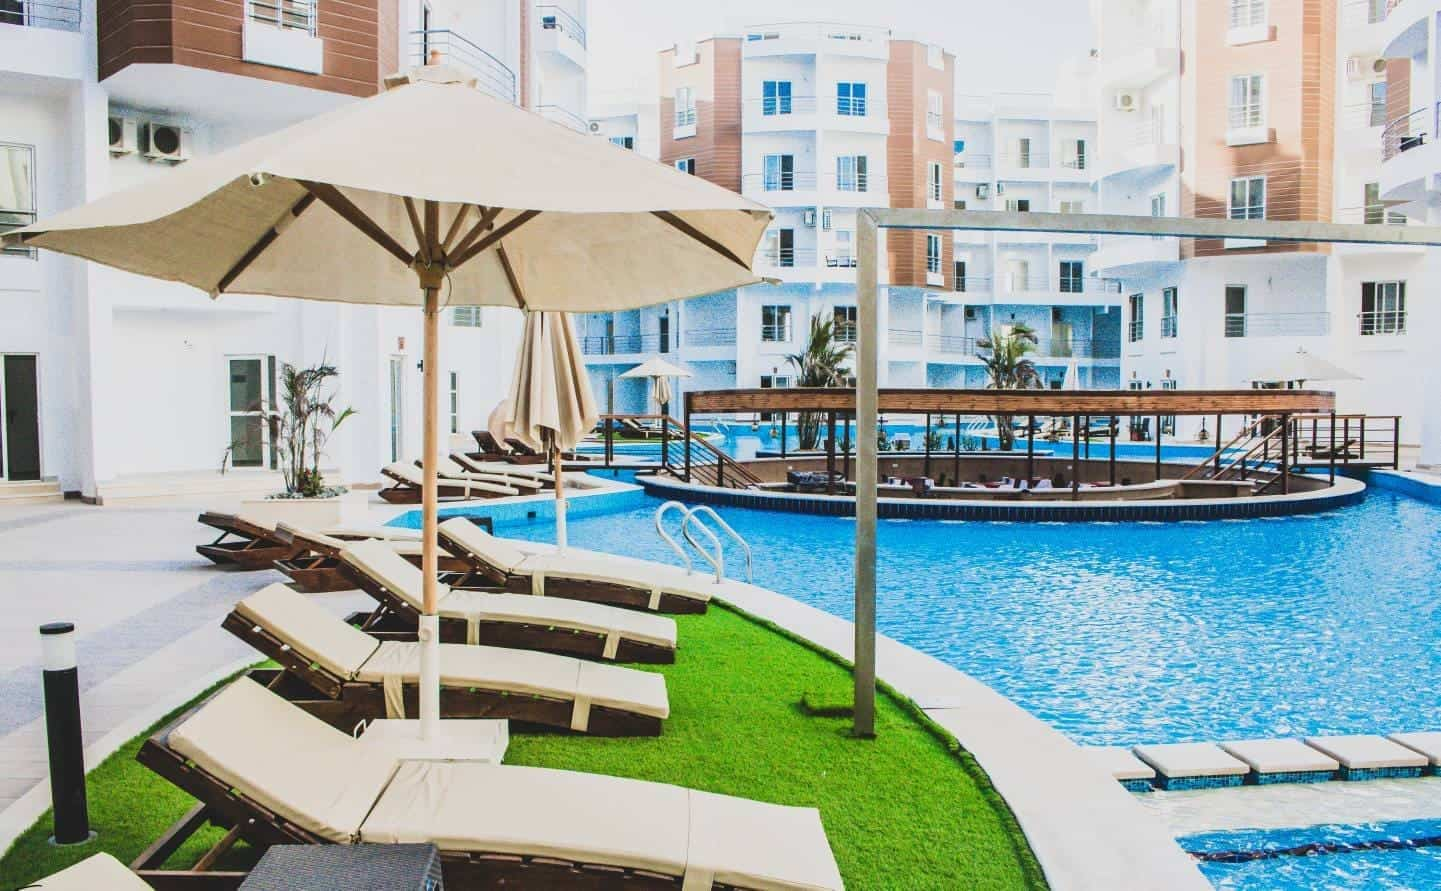 40611256-0-Aqua-Palms-Resort-2-